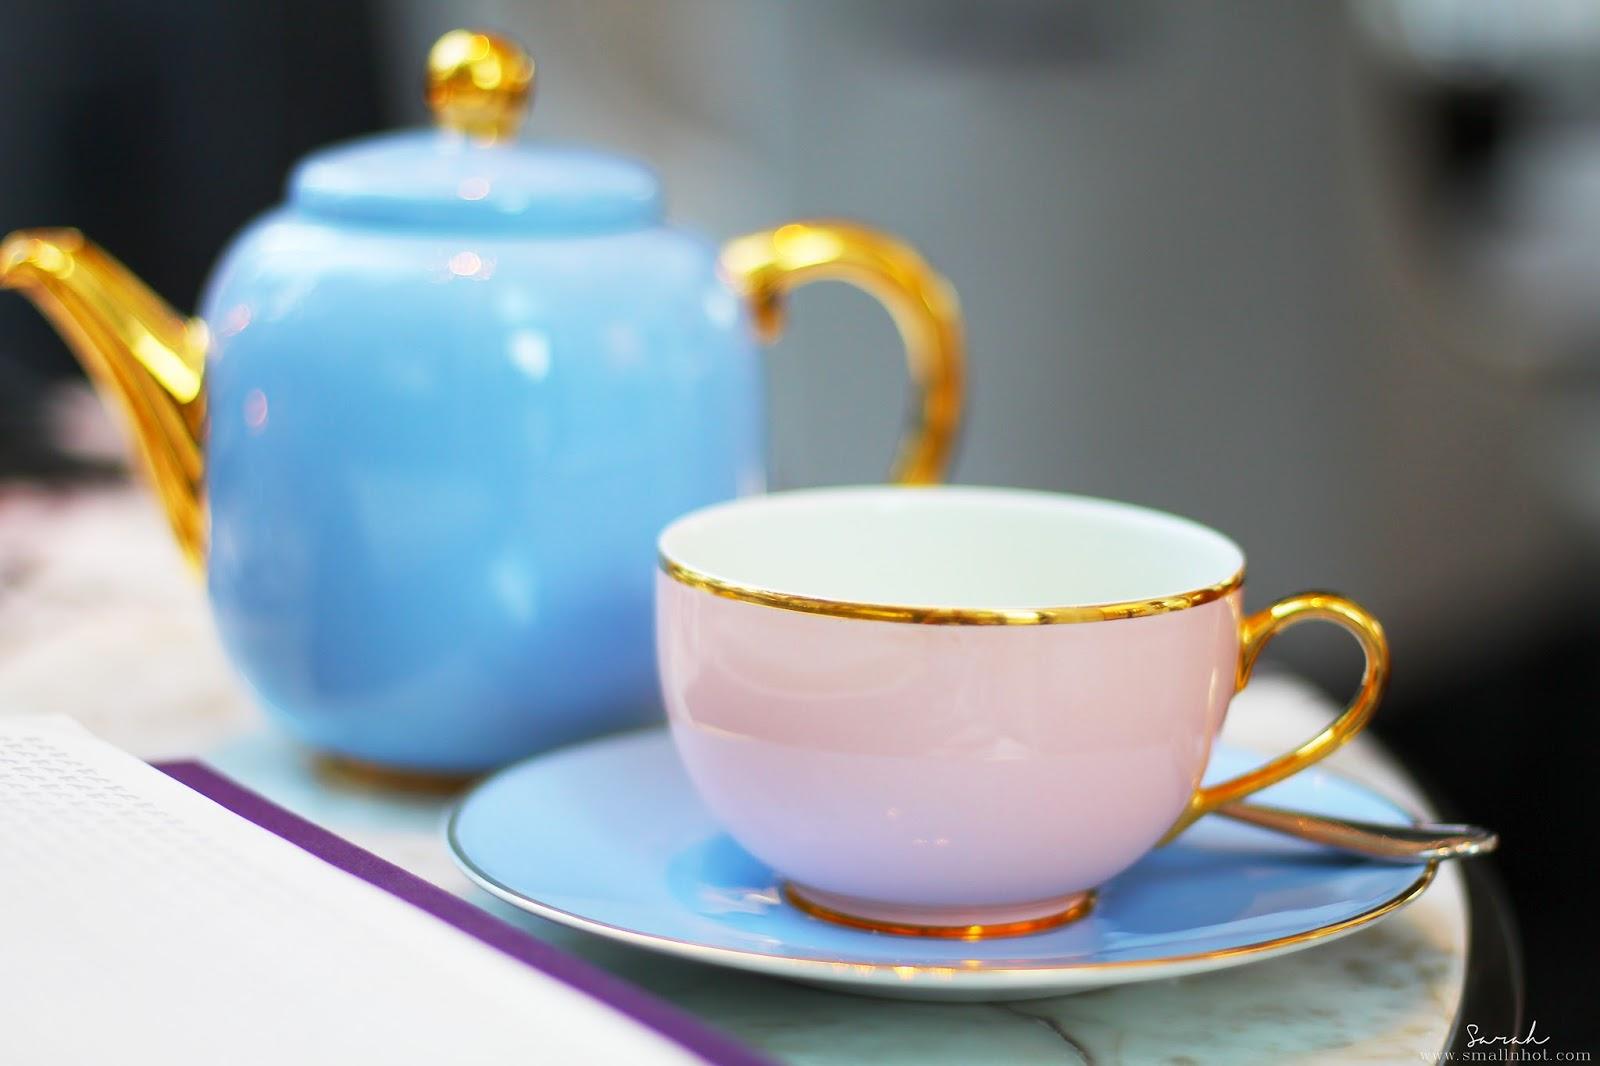 Drawn teacup afternoon tea #14